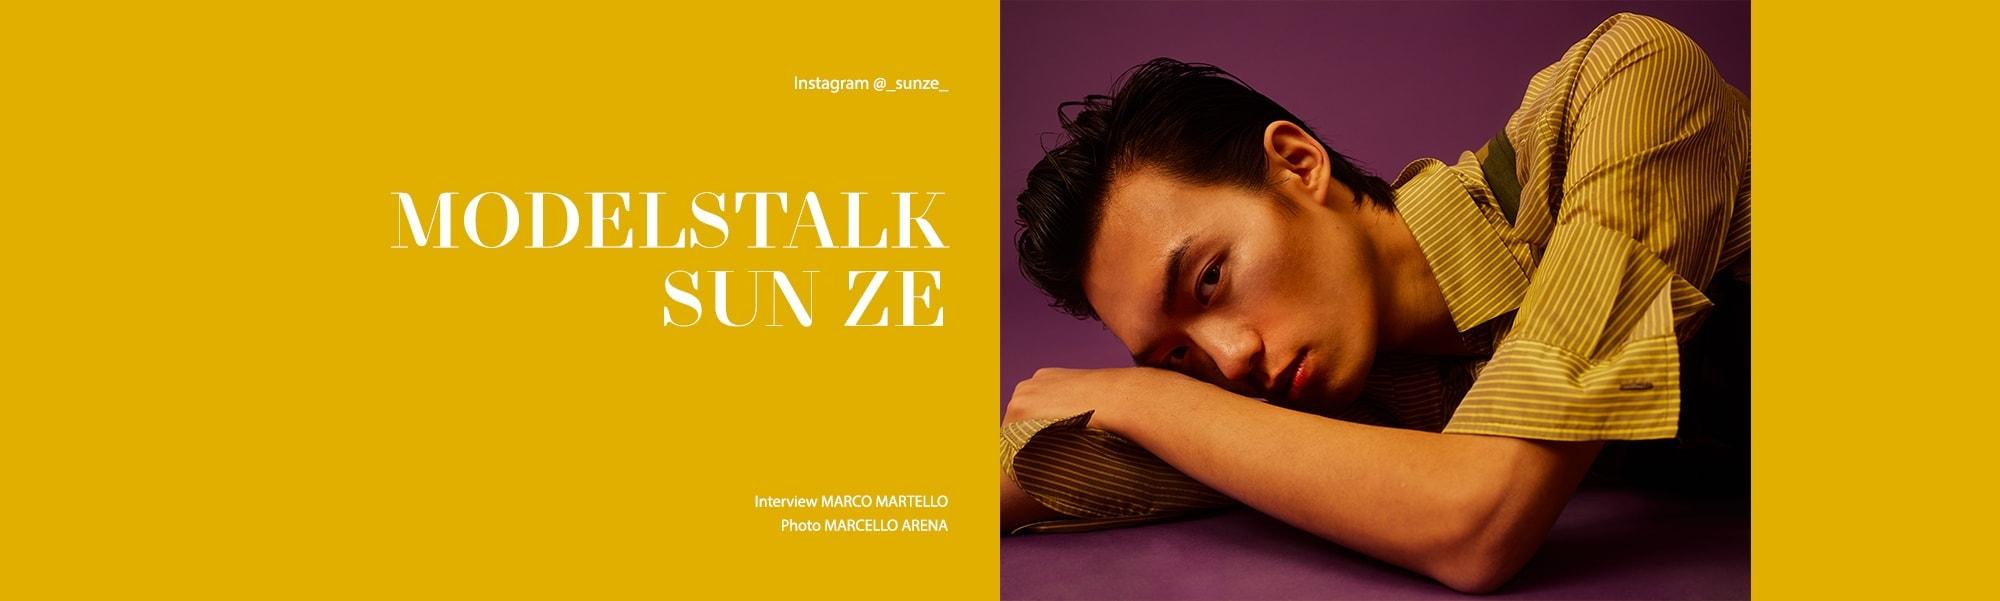 sun-ze_banner3_thegreatestmagazine